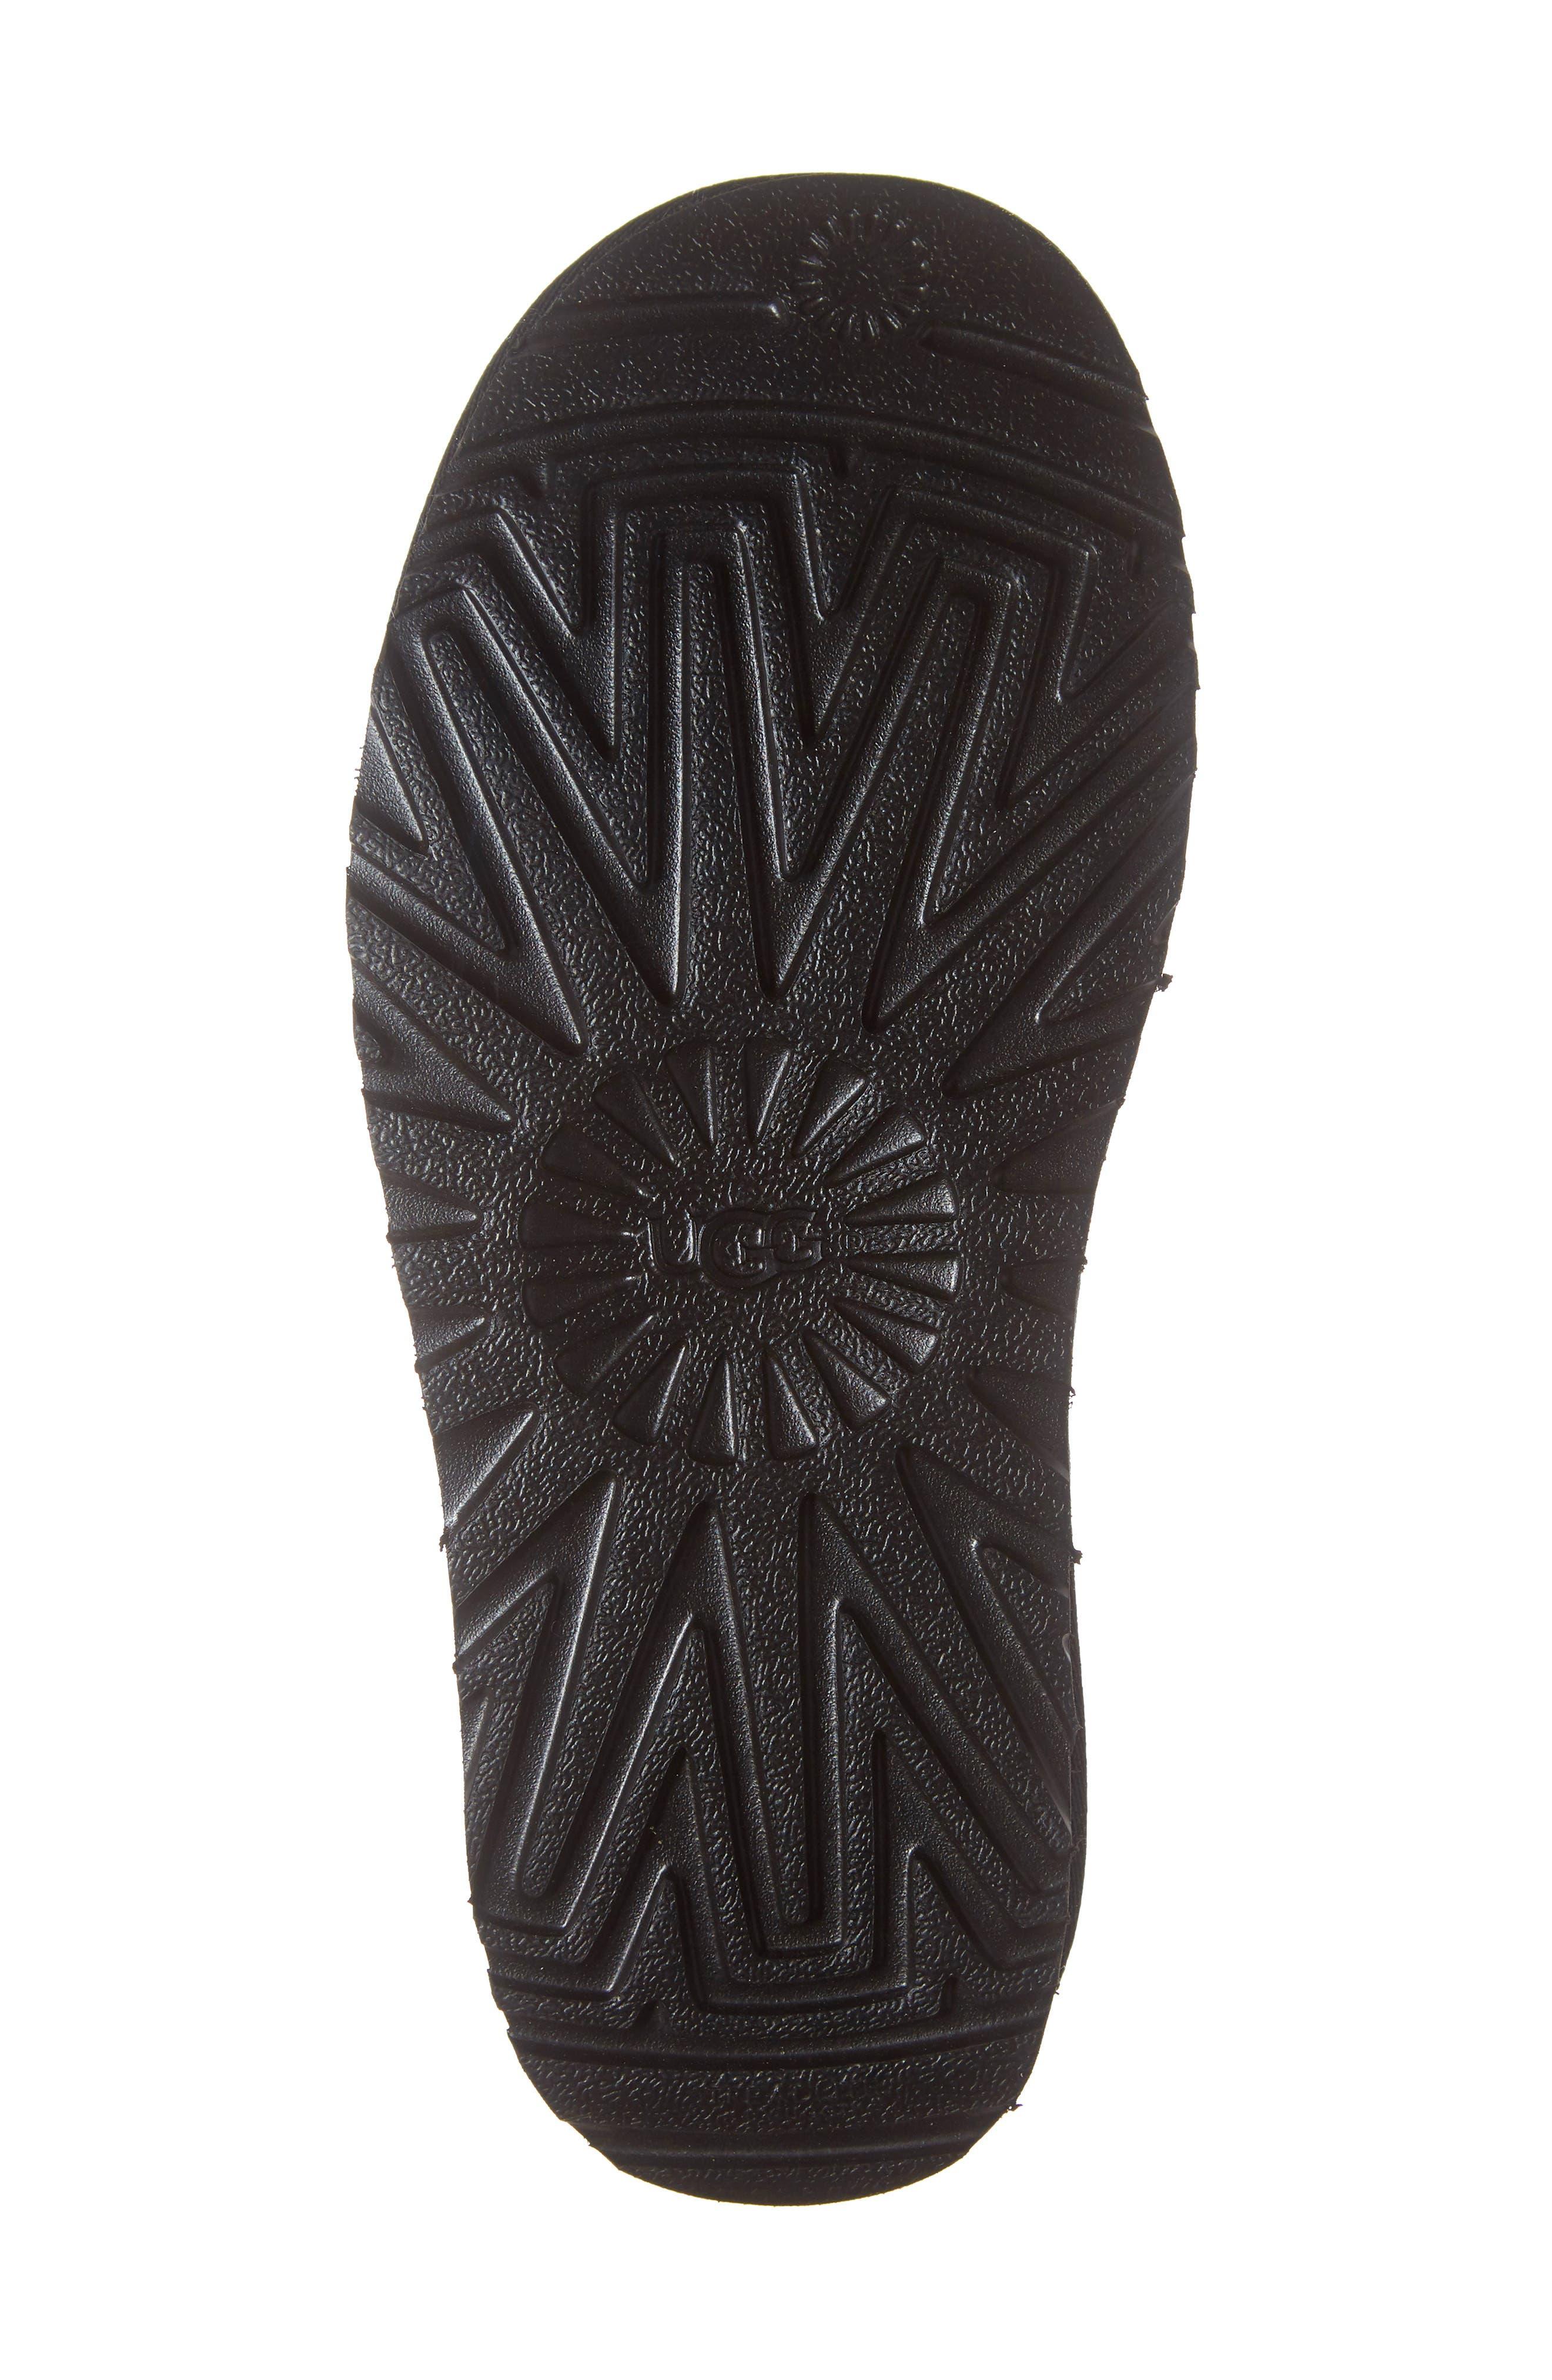 x UGG<sup>®</sup> Genuine Shearling Slide Sandal,                             Alternate thumbnail 6, color,                             001